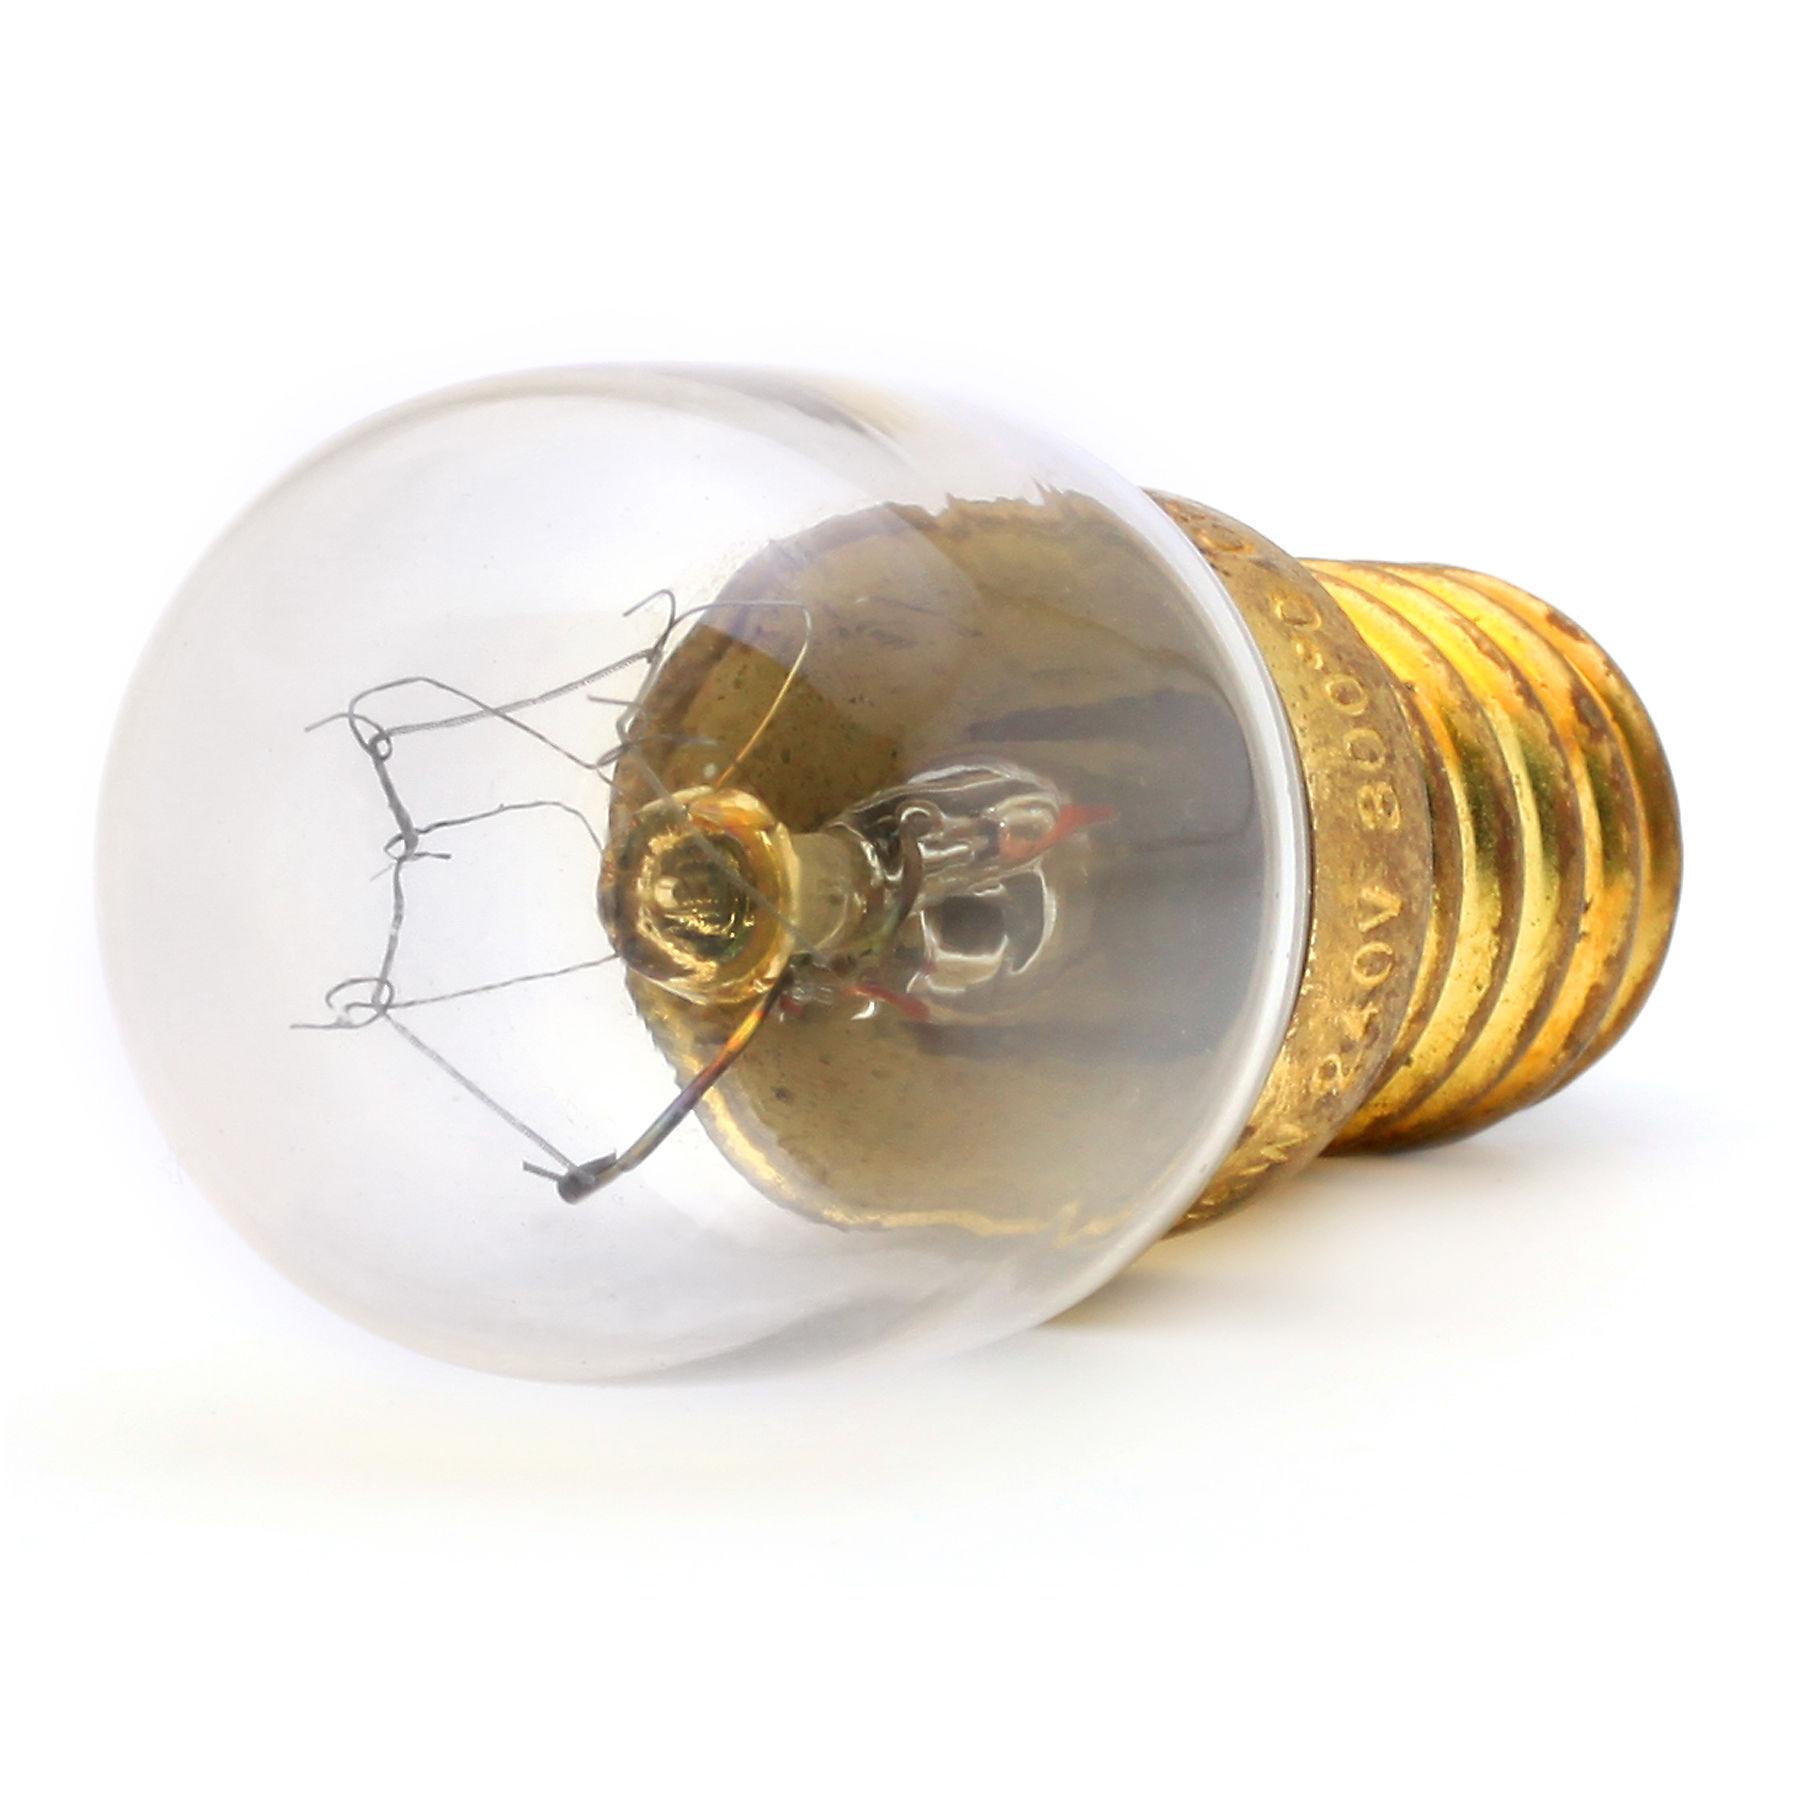 3 x 25w SES E14 Small Screw Cap 300° Branded Oven Light Bulb NEFF BOSH HOTPOINT